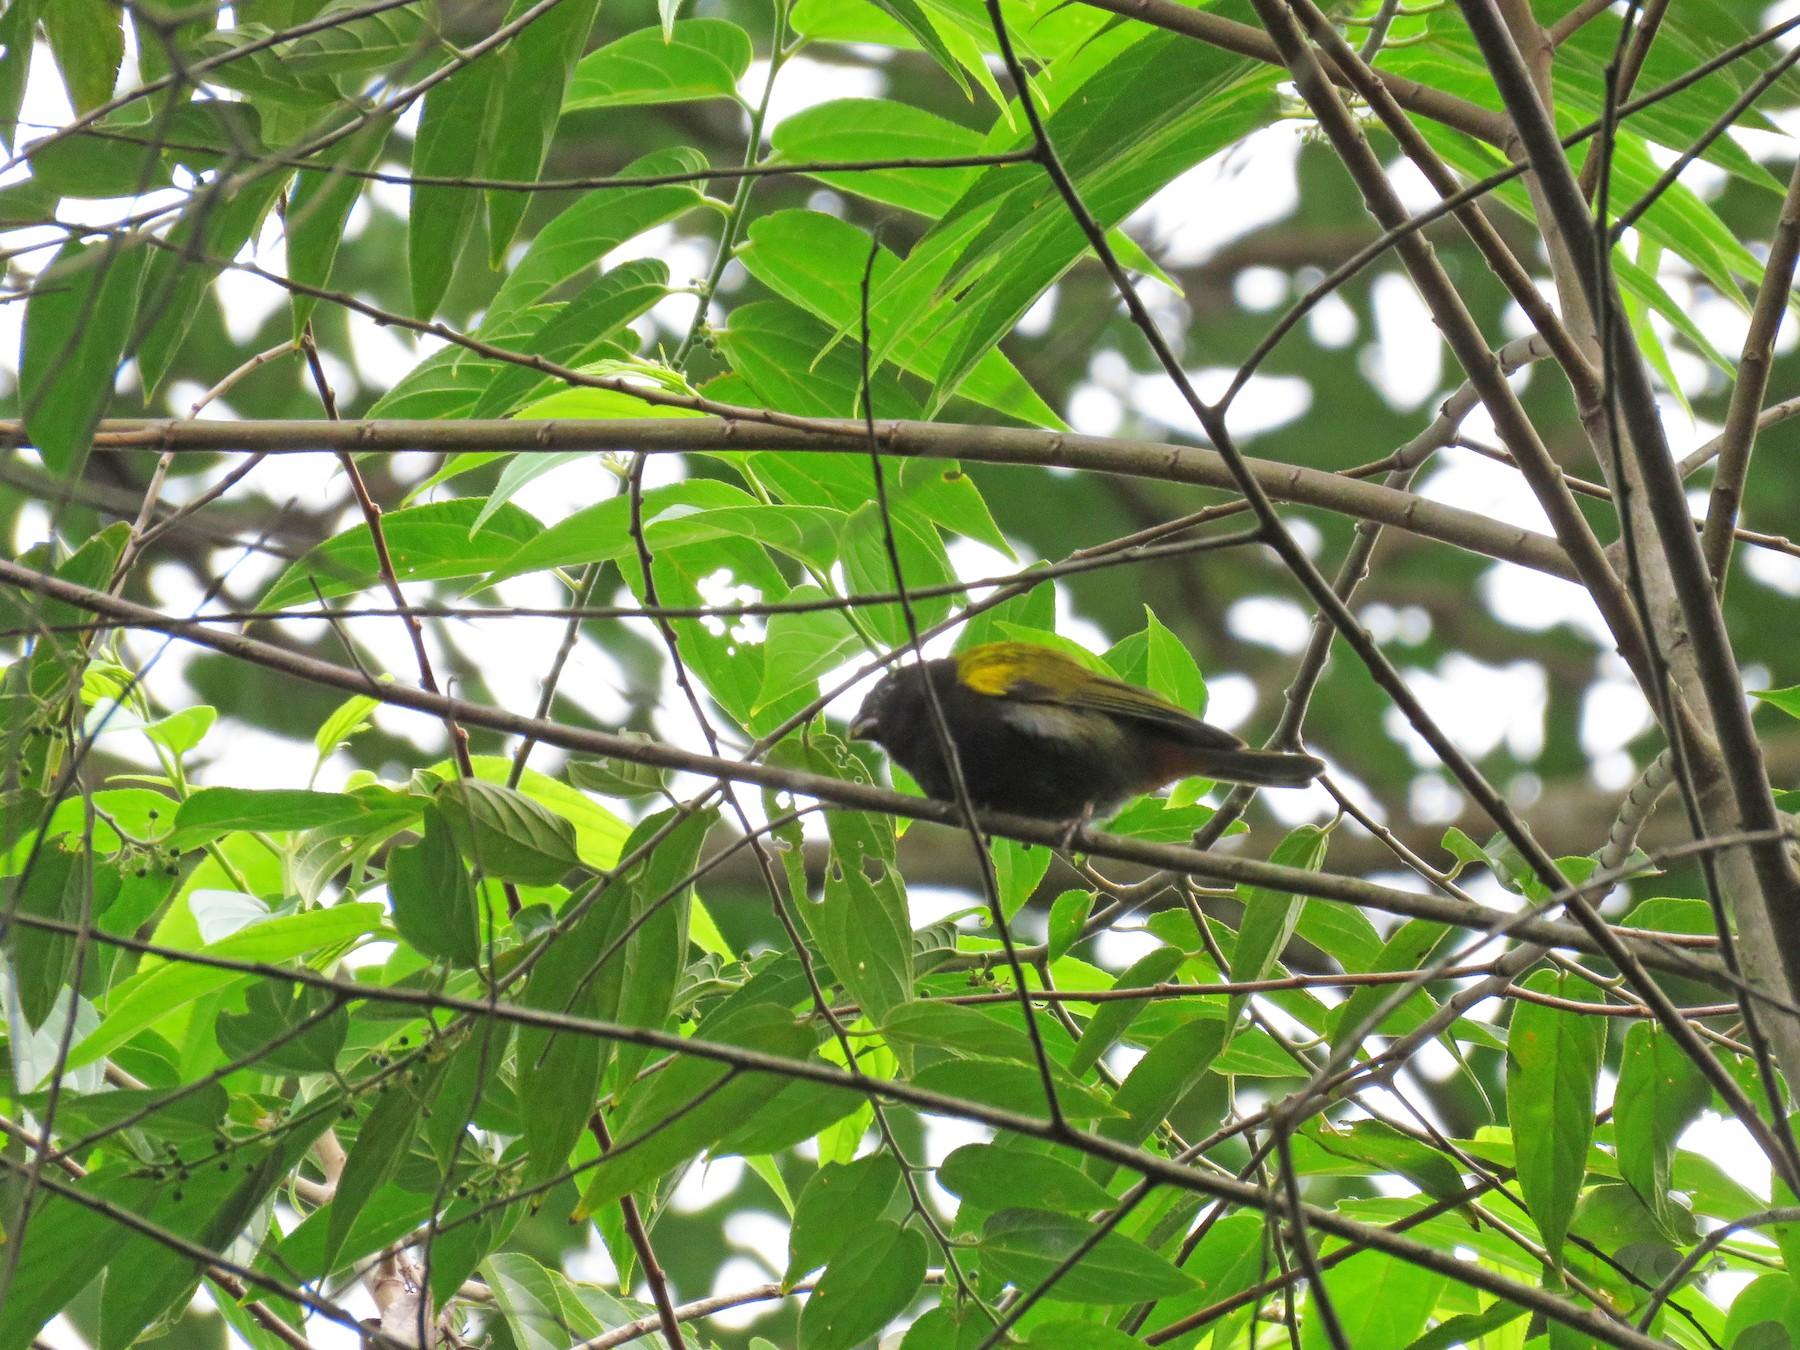 Yellow-shouldered Grassquit - Carla Bregman